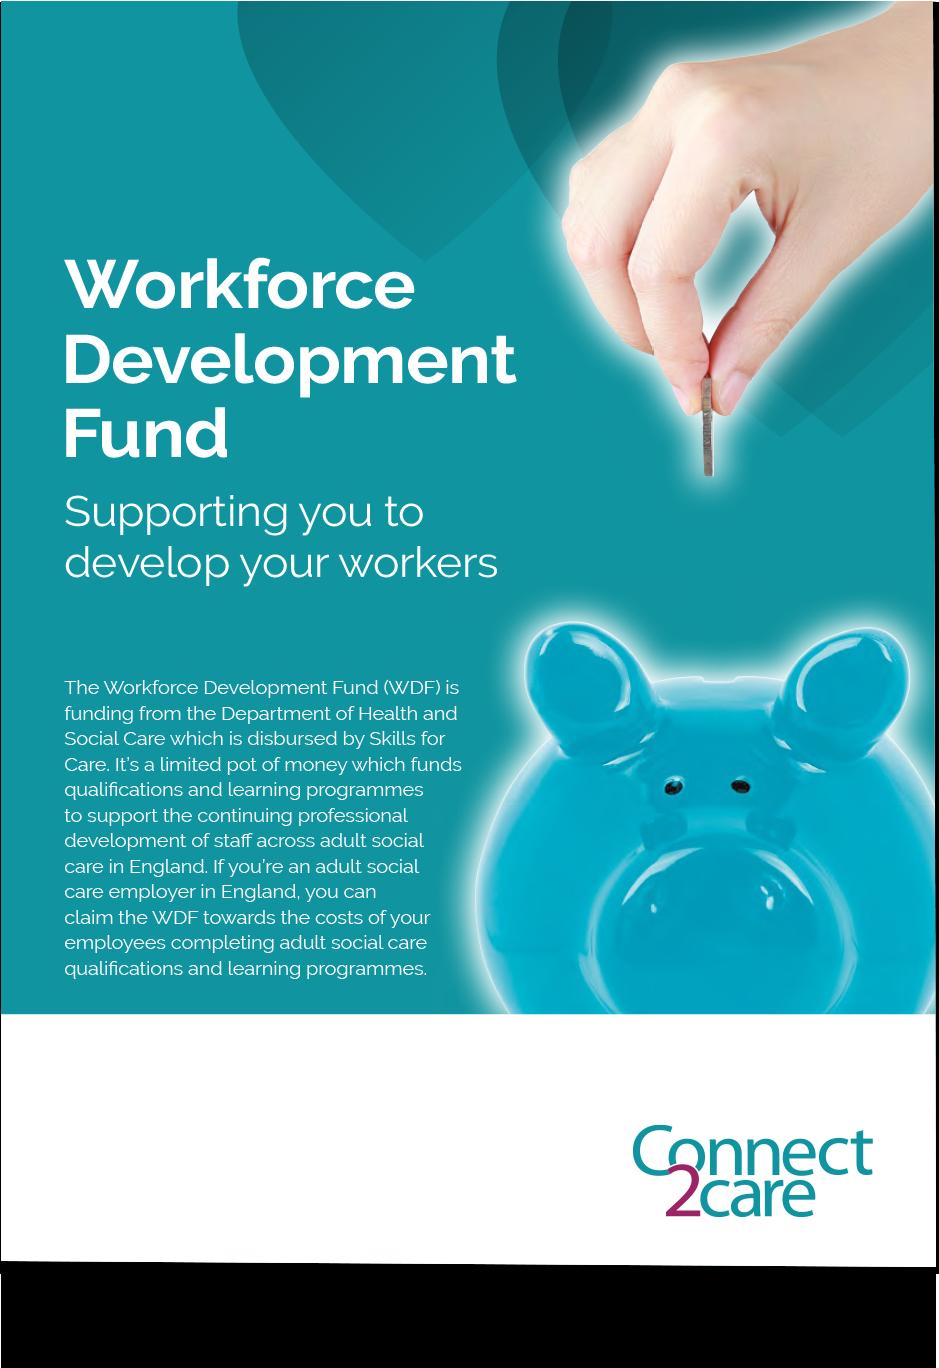 Workforce Development Fund eguide thumbnail